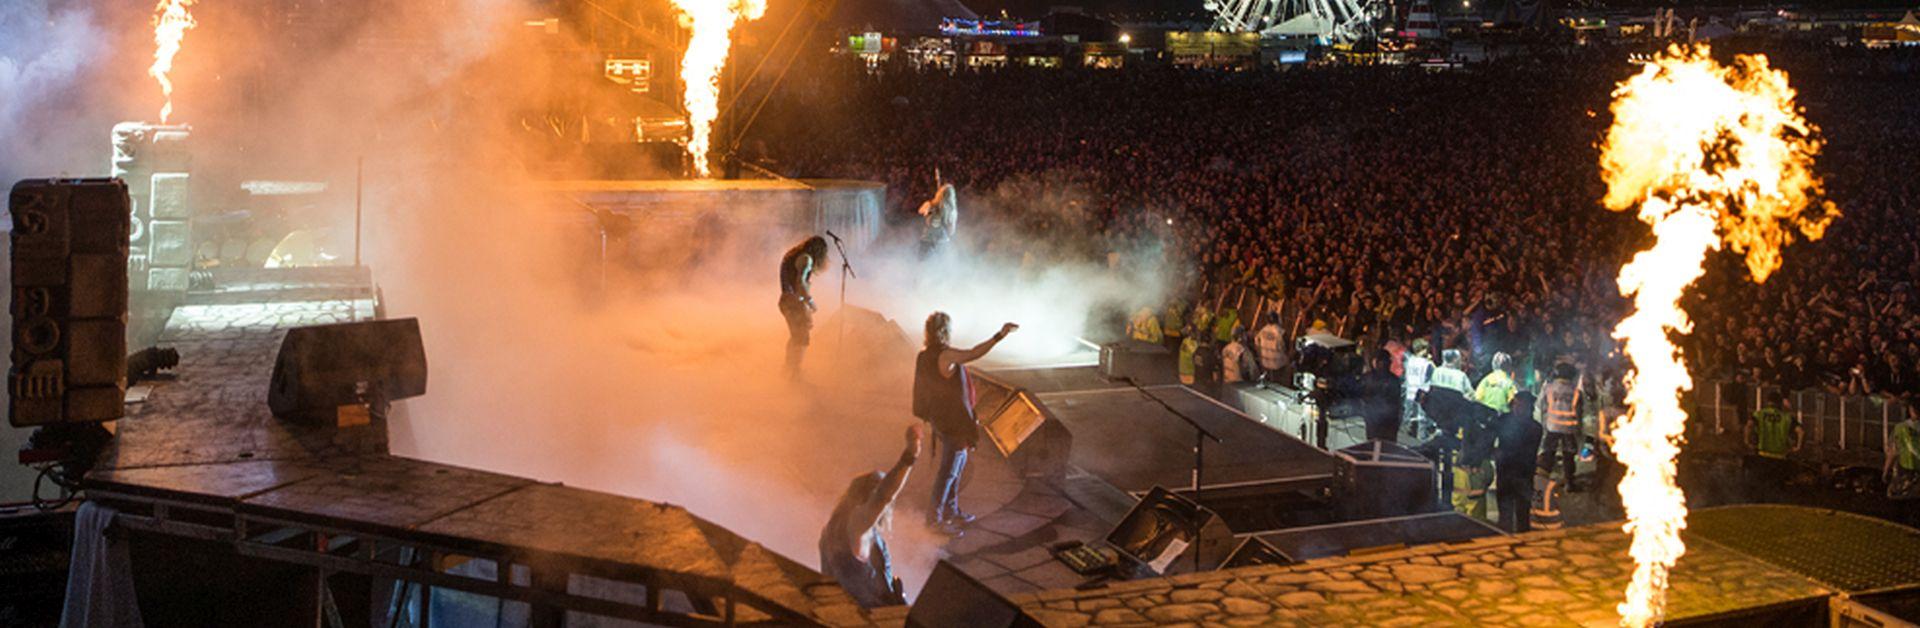 THE BOOK OF SOULS Iron Maiden najavio koncert u Zagrebu 24.07.2018